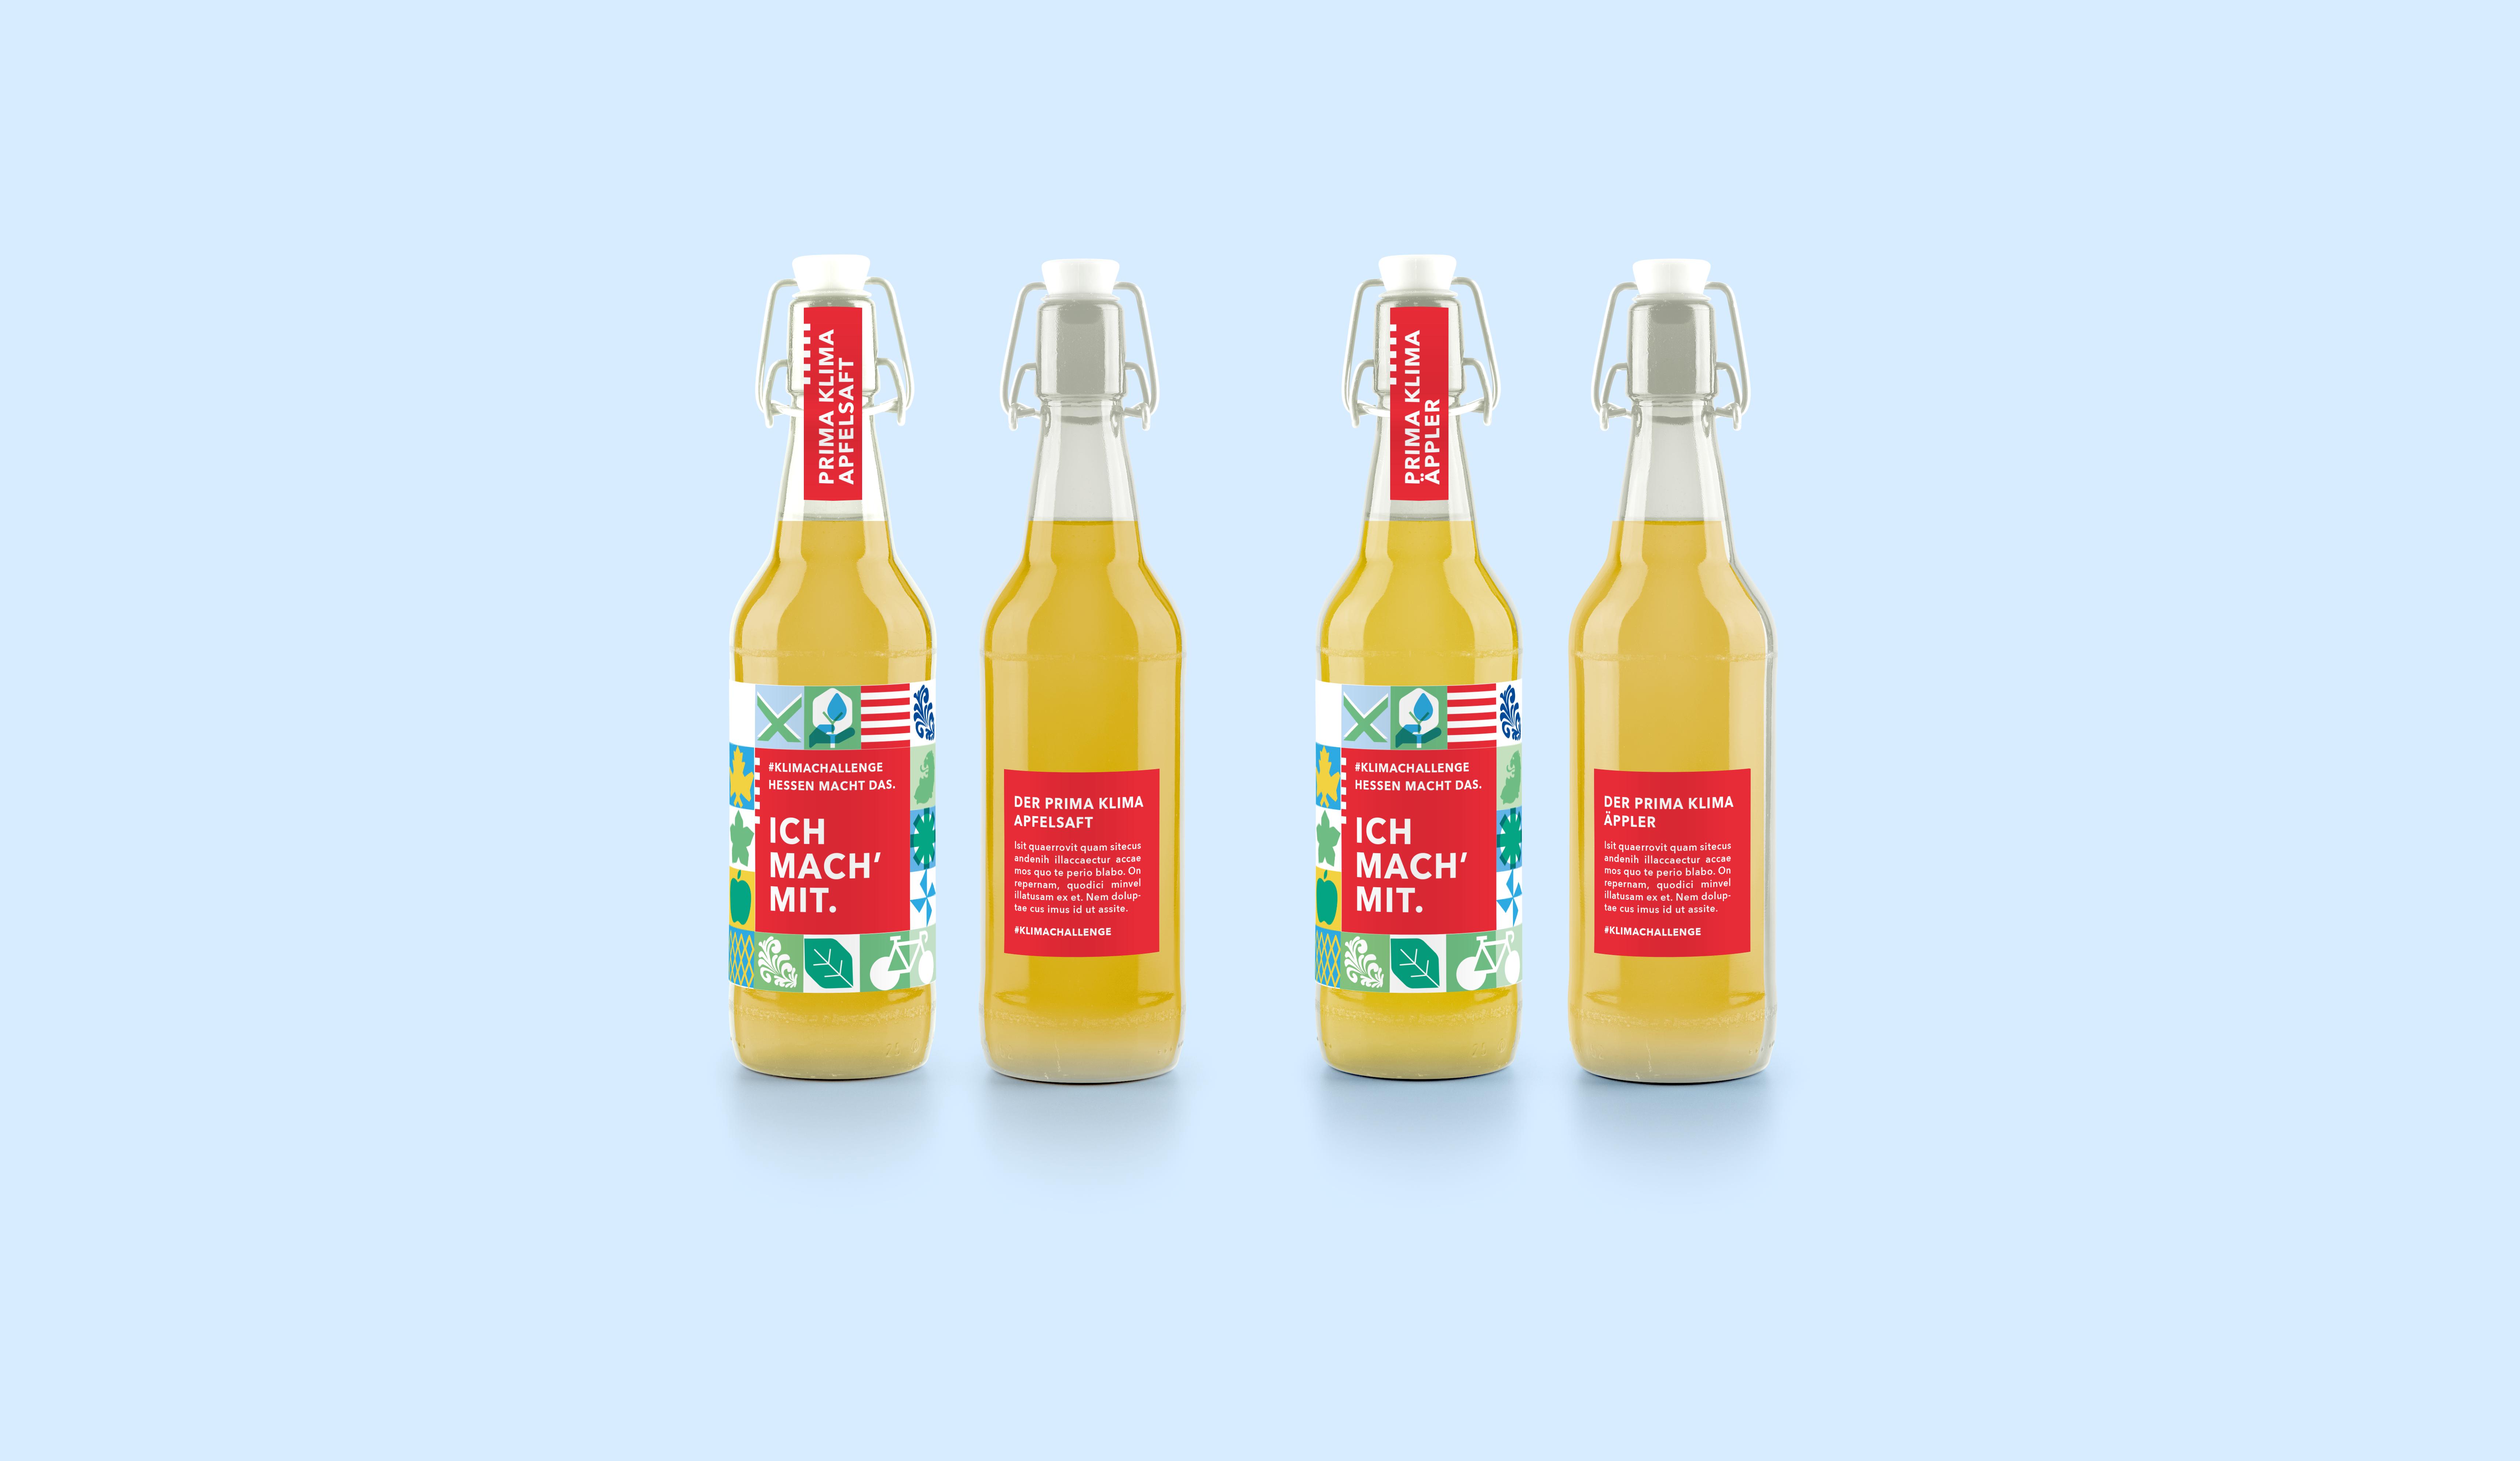 Artisan-Beer-Bottle-MockUp_KlimaschutzCaseStudy-1